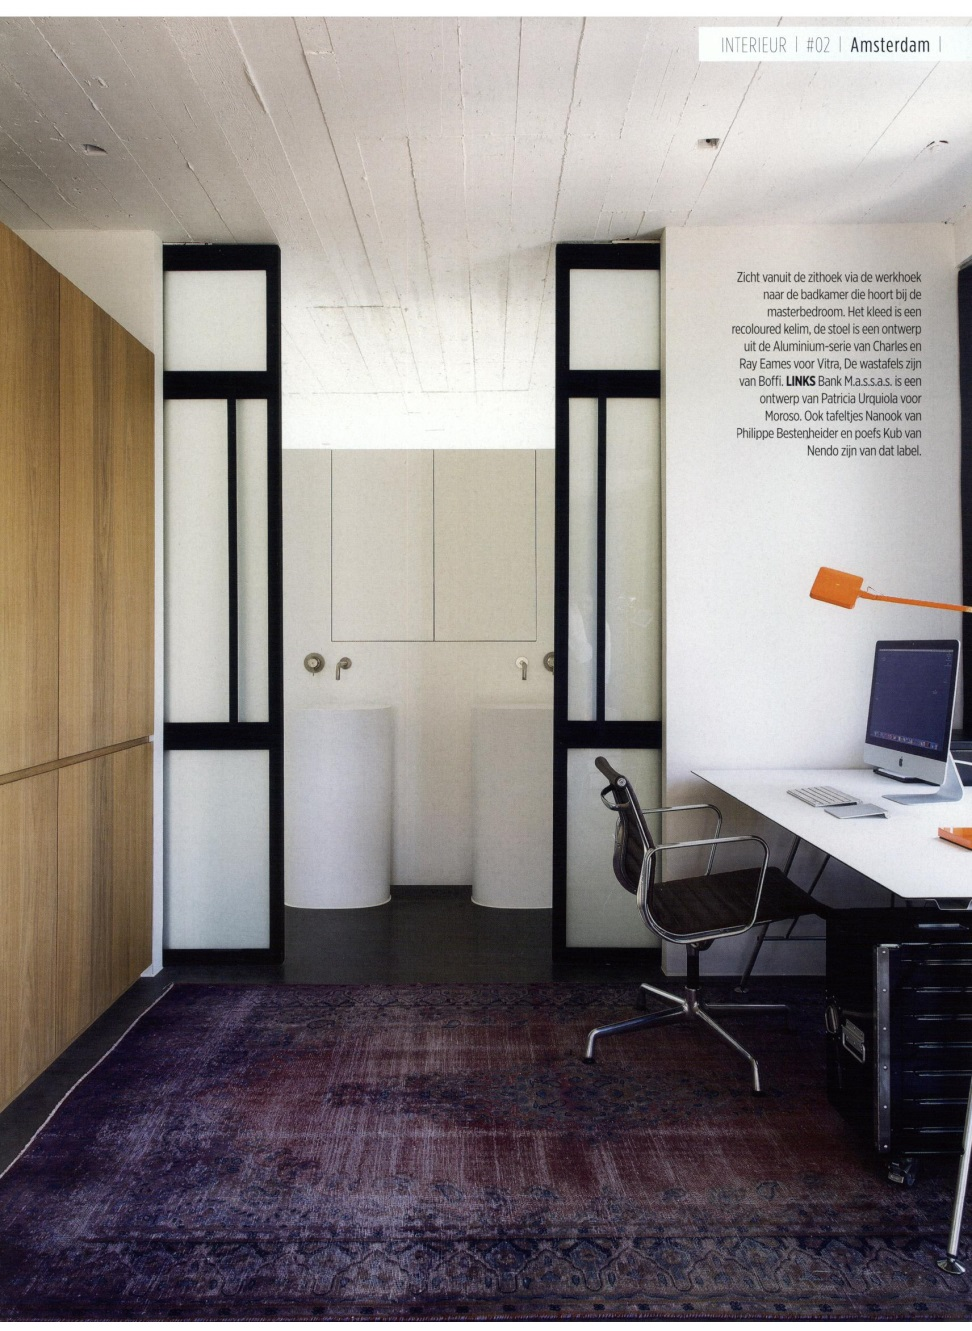 Moroso eigenhuis interieur 01 04 2016 92048991 moroso for Eigenhuis interieur